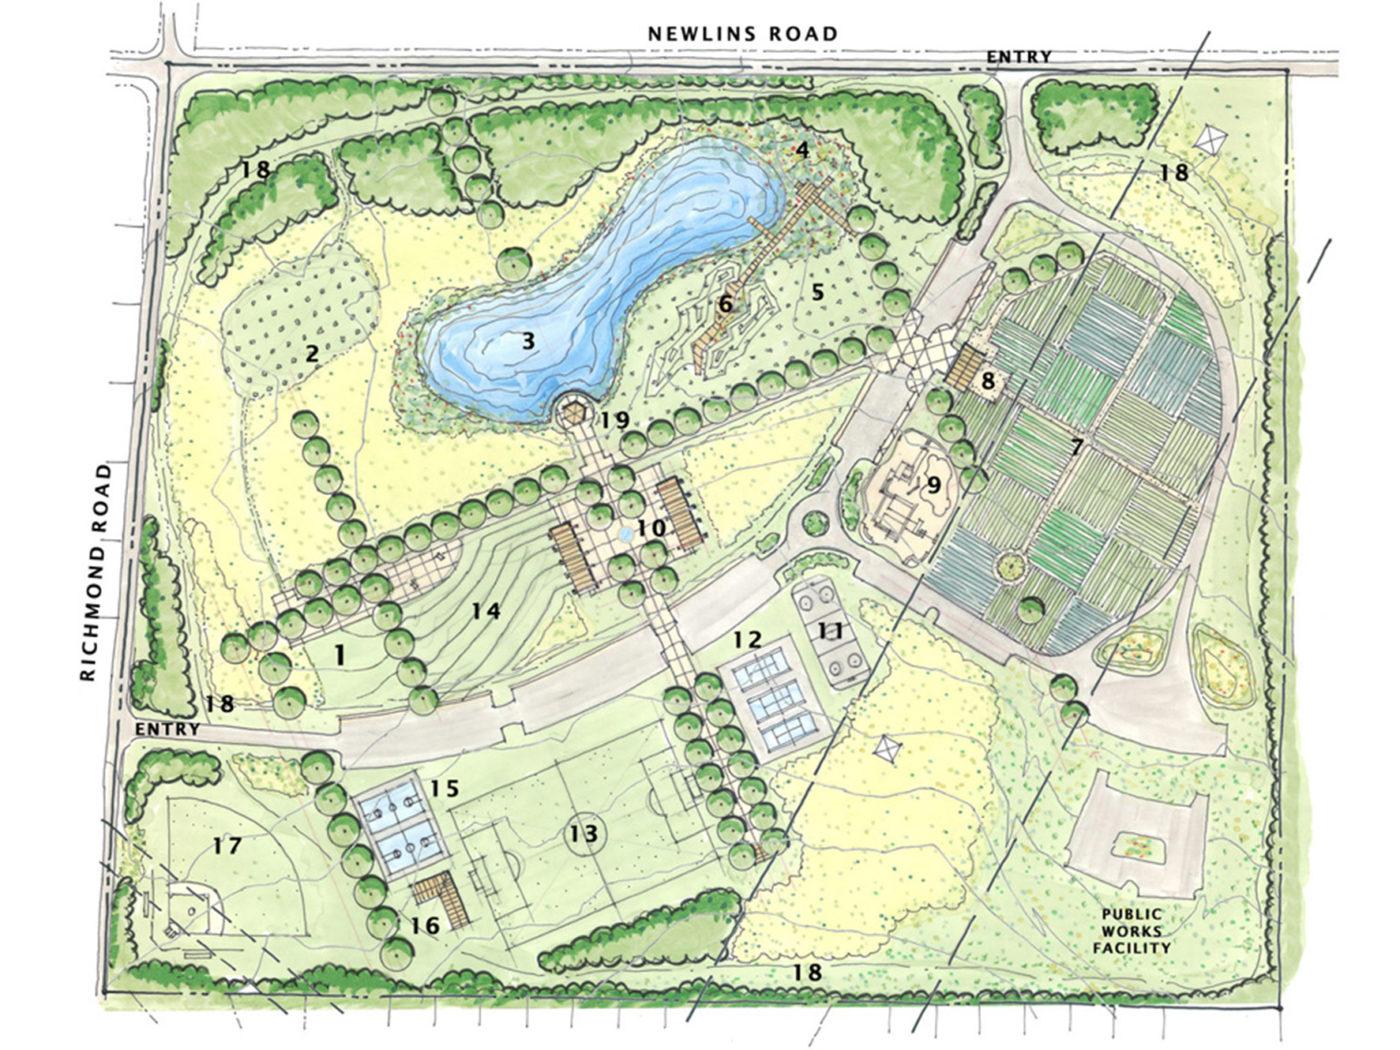 Forks Township, Park Master Plan